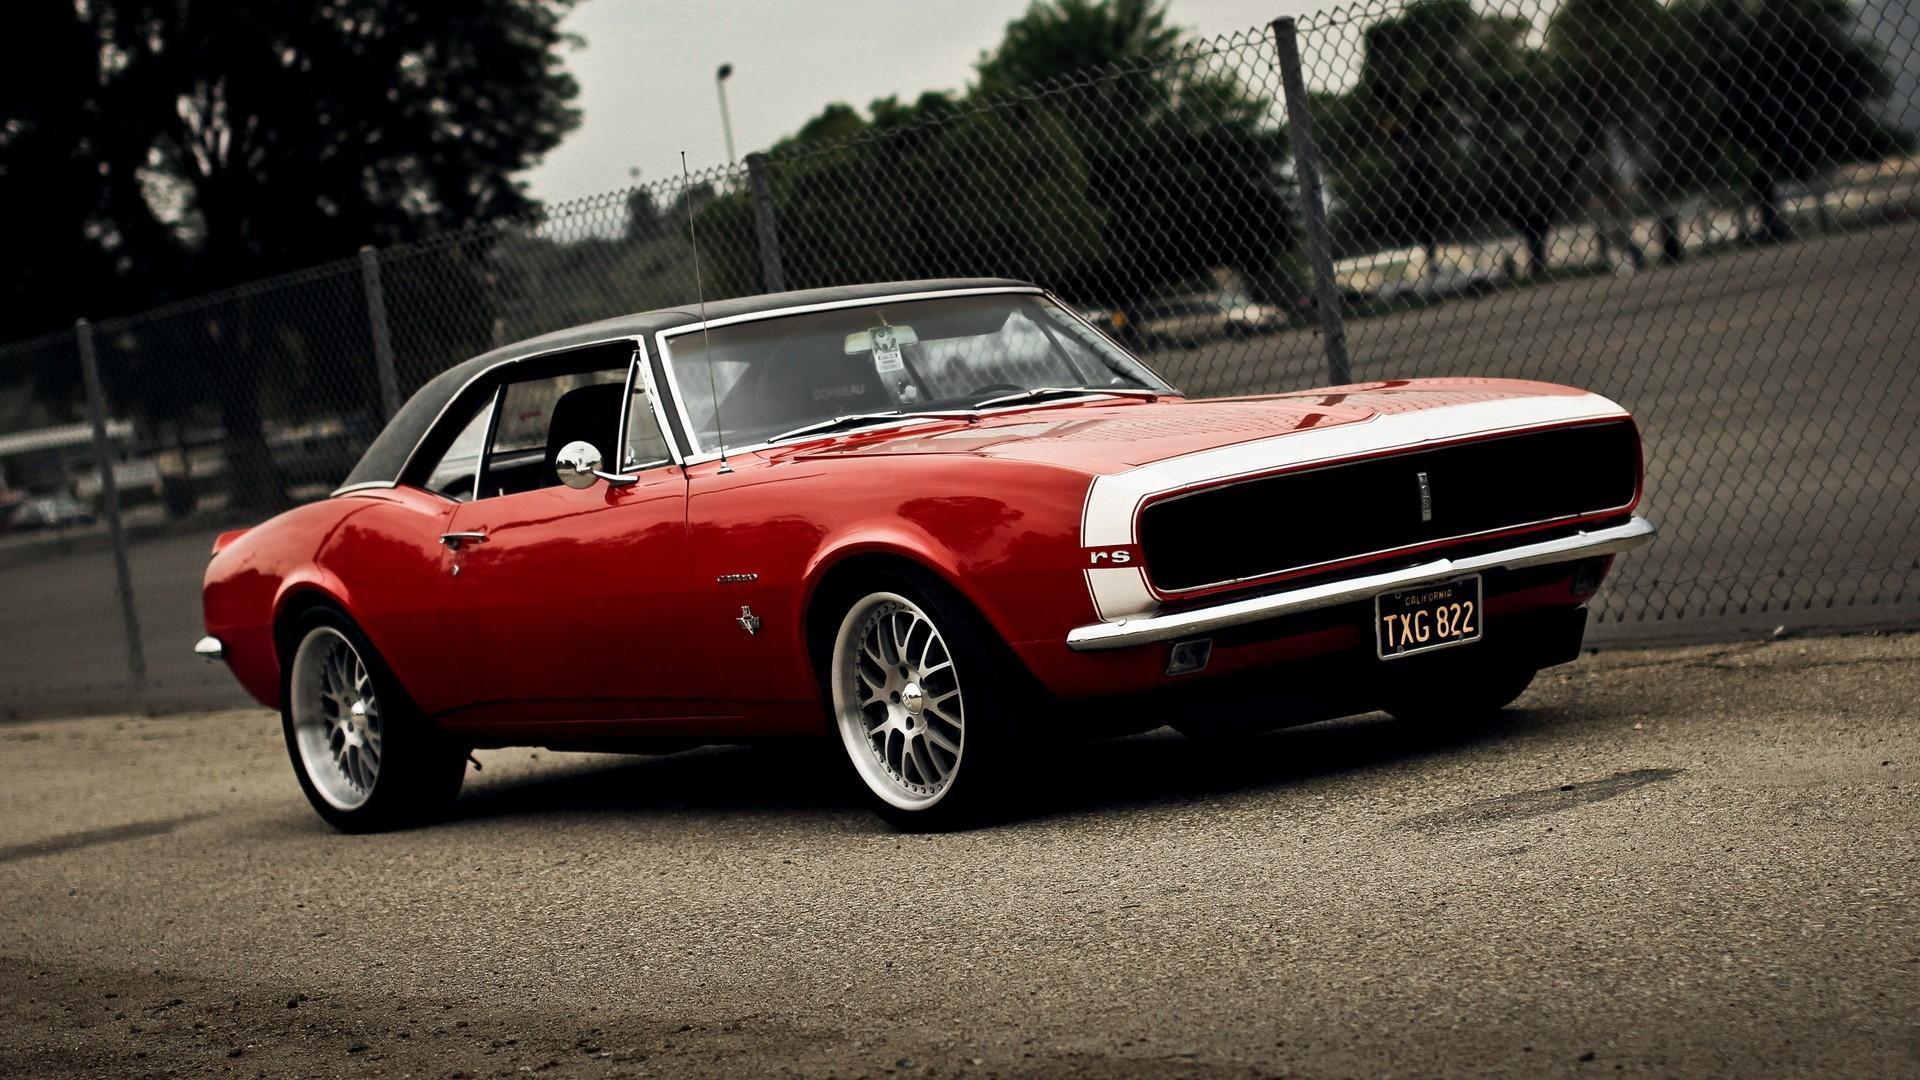 Wallpaper : Sports Car, American Cars, Chevrolet Camaro